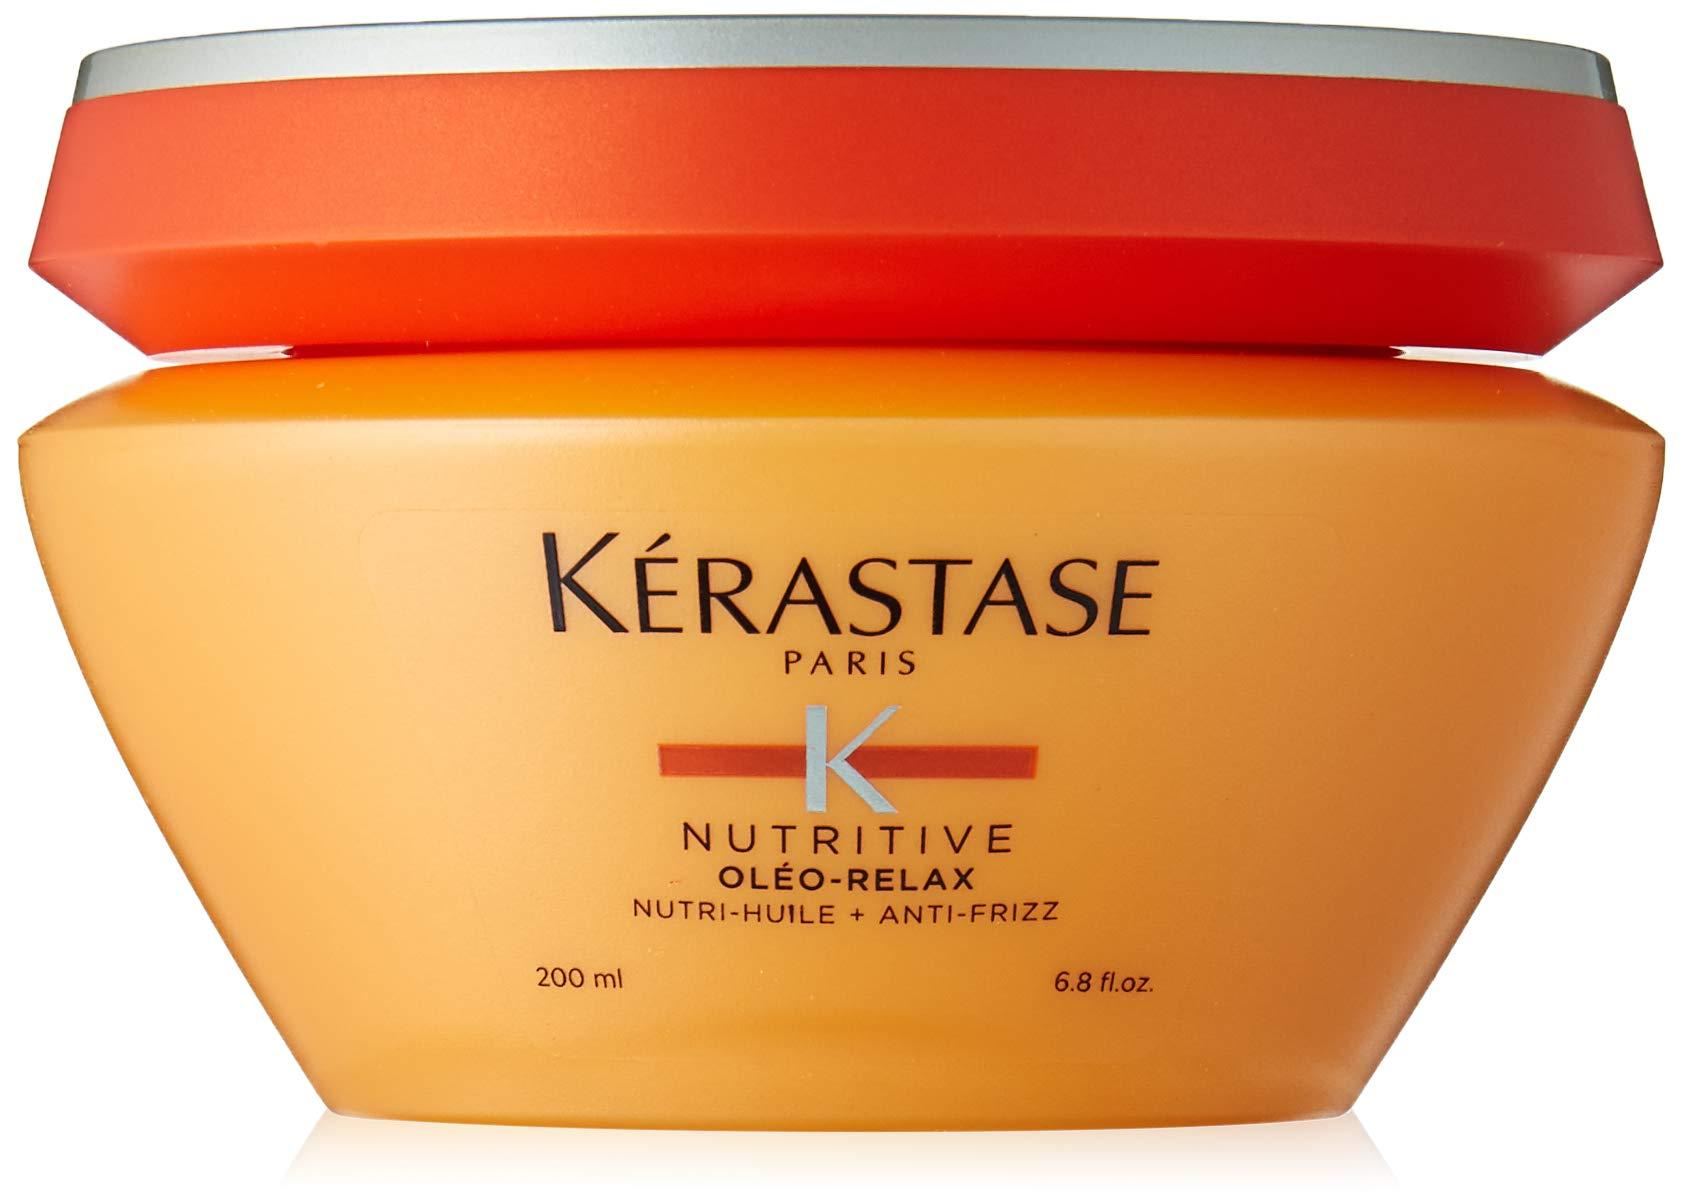 Kerastase Nutritive Oleo-Relax Anti-Frizz Masque, 6.8 Ounce